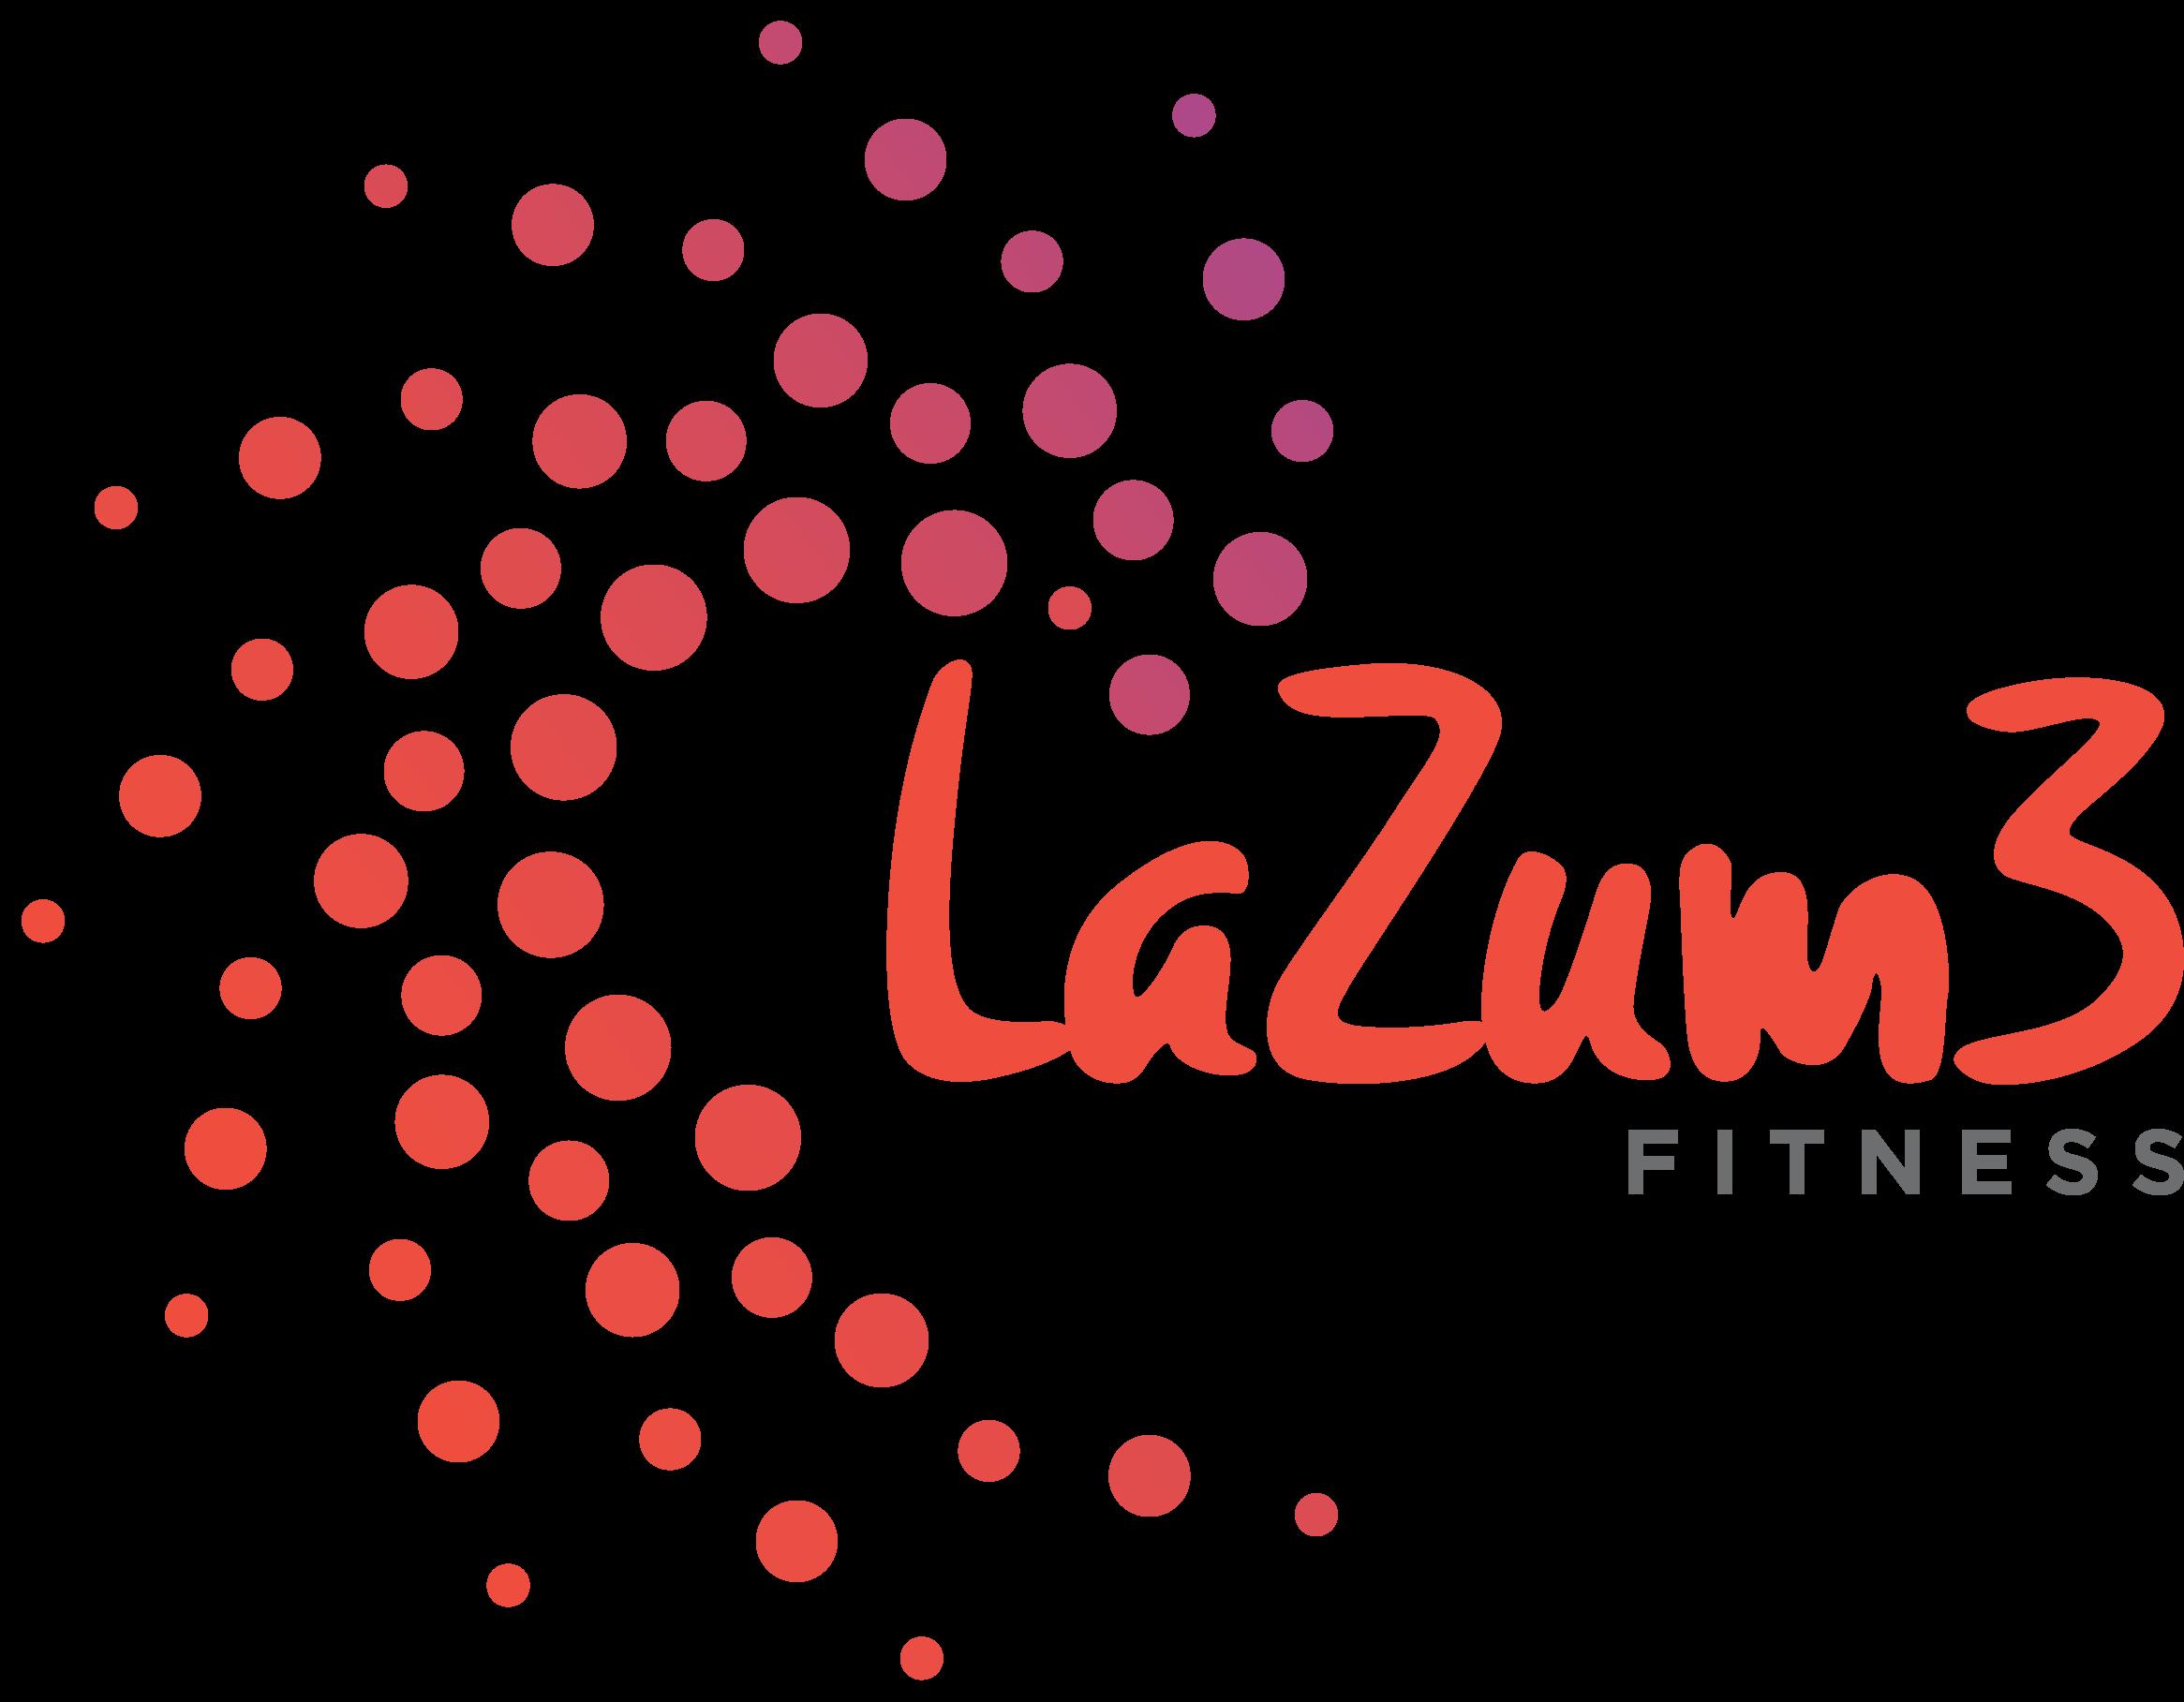 LaZum3